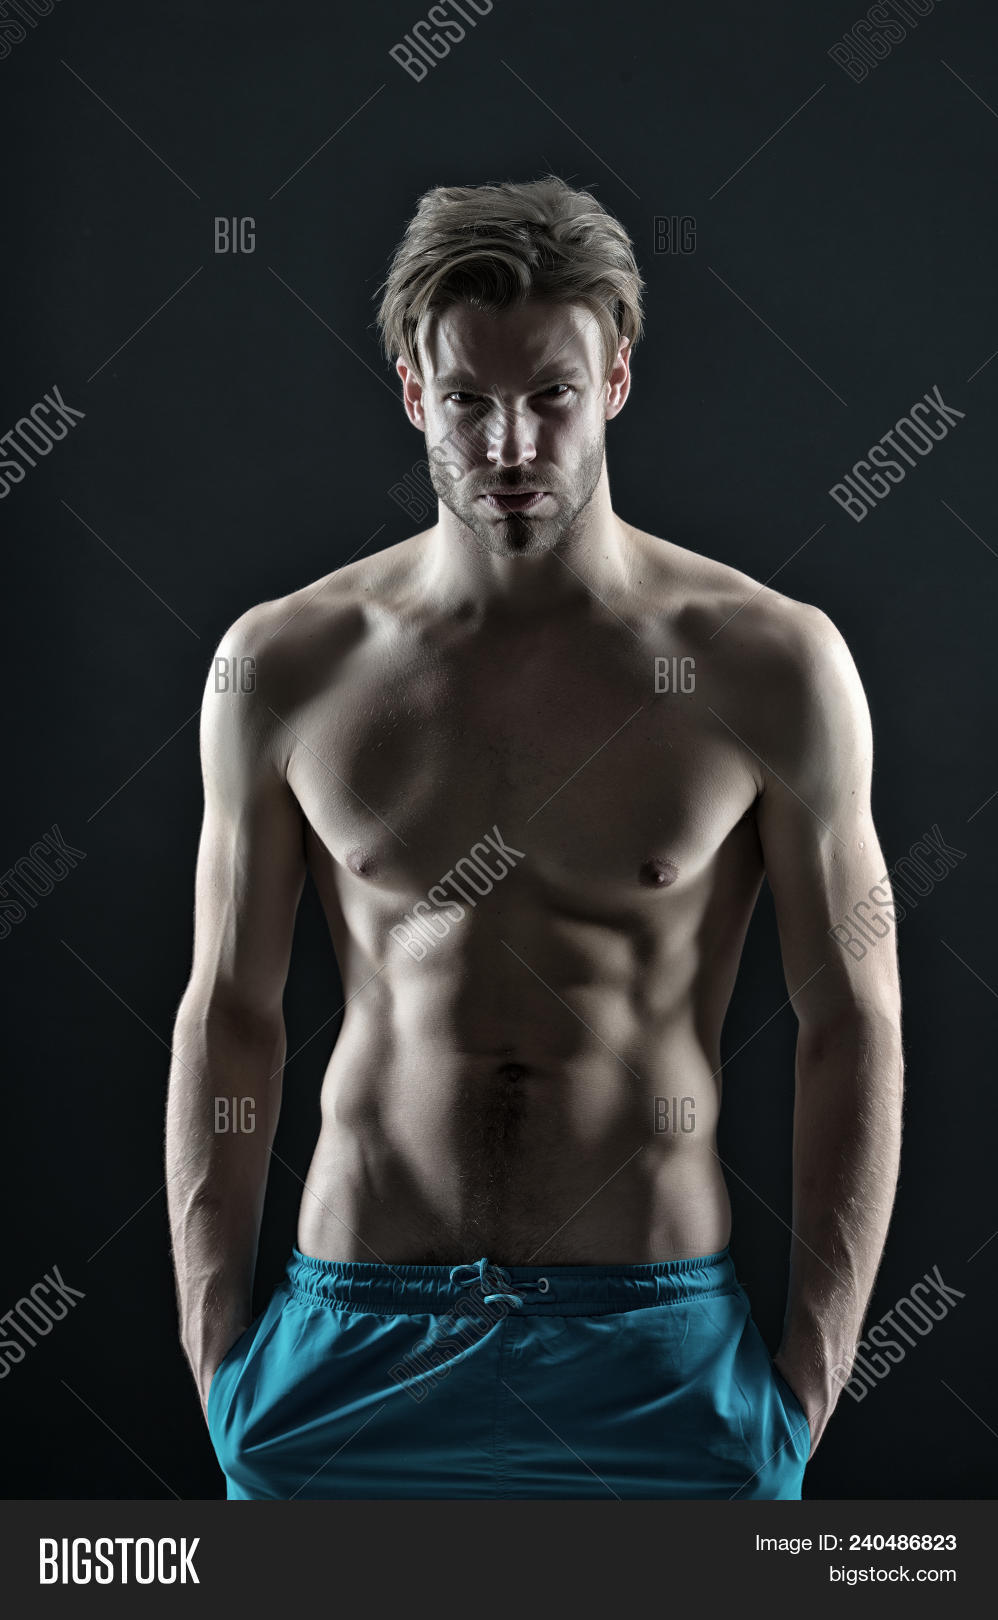 Training Workout Image Photo Free Trial Bigstock